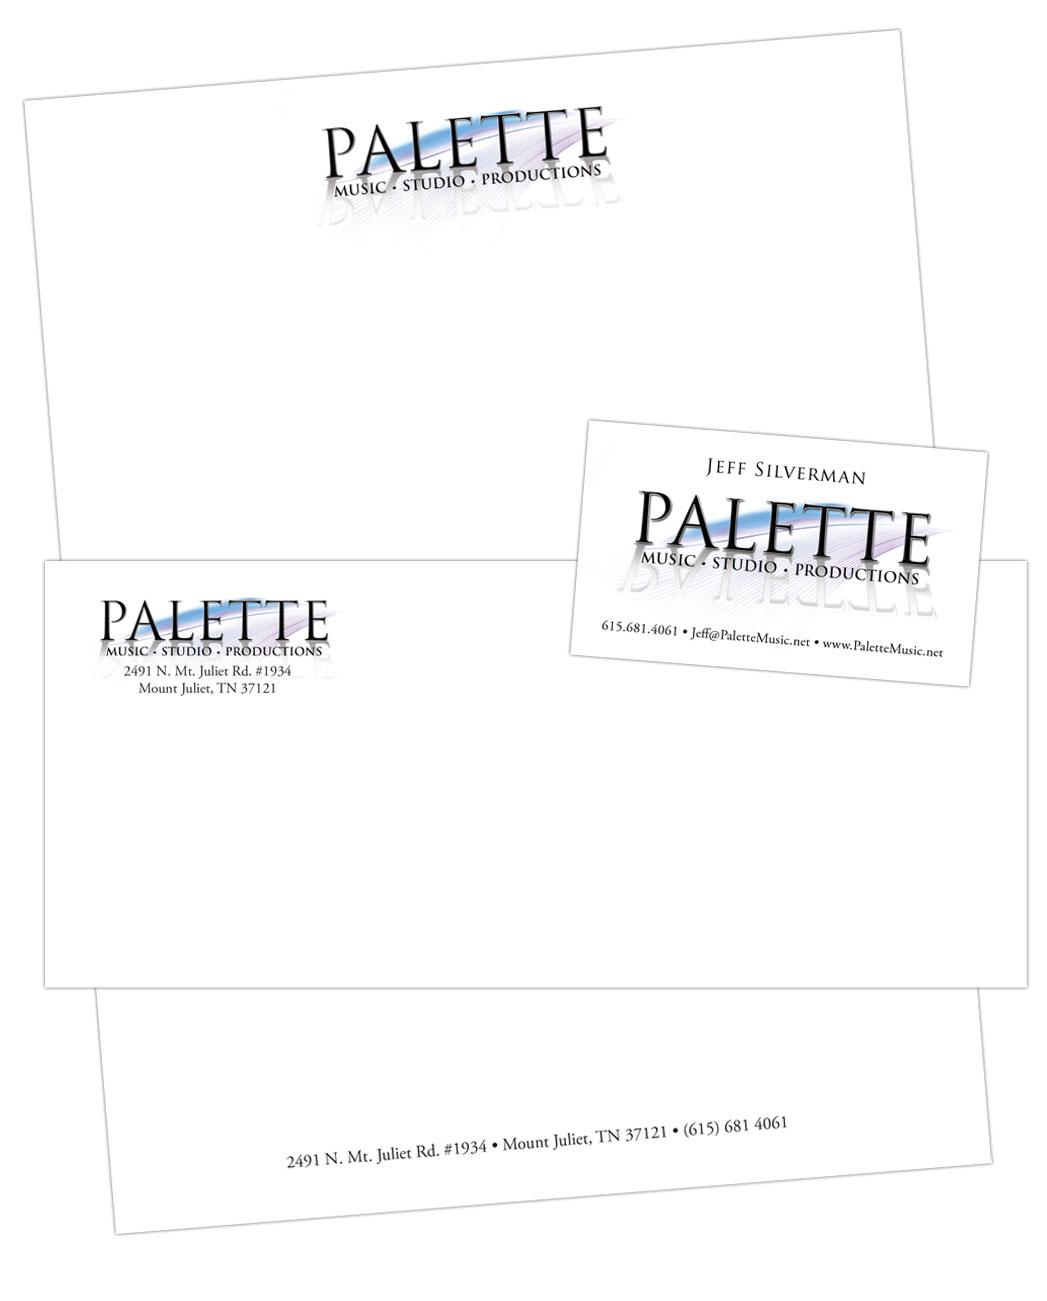 Mt. Juliet Letterhead, Envelopes and Business Cards